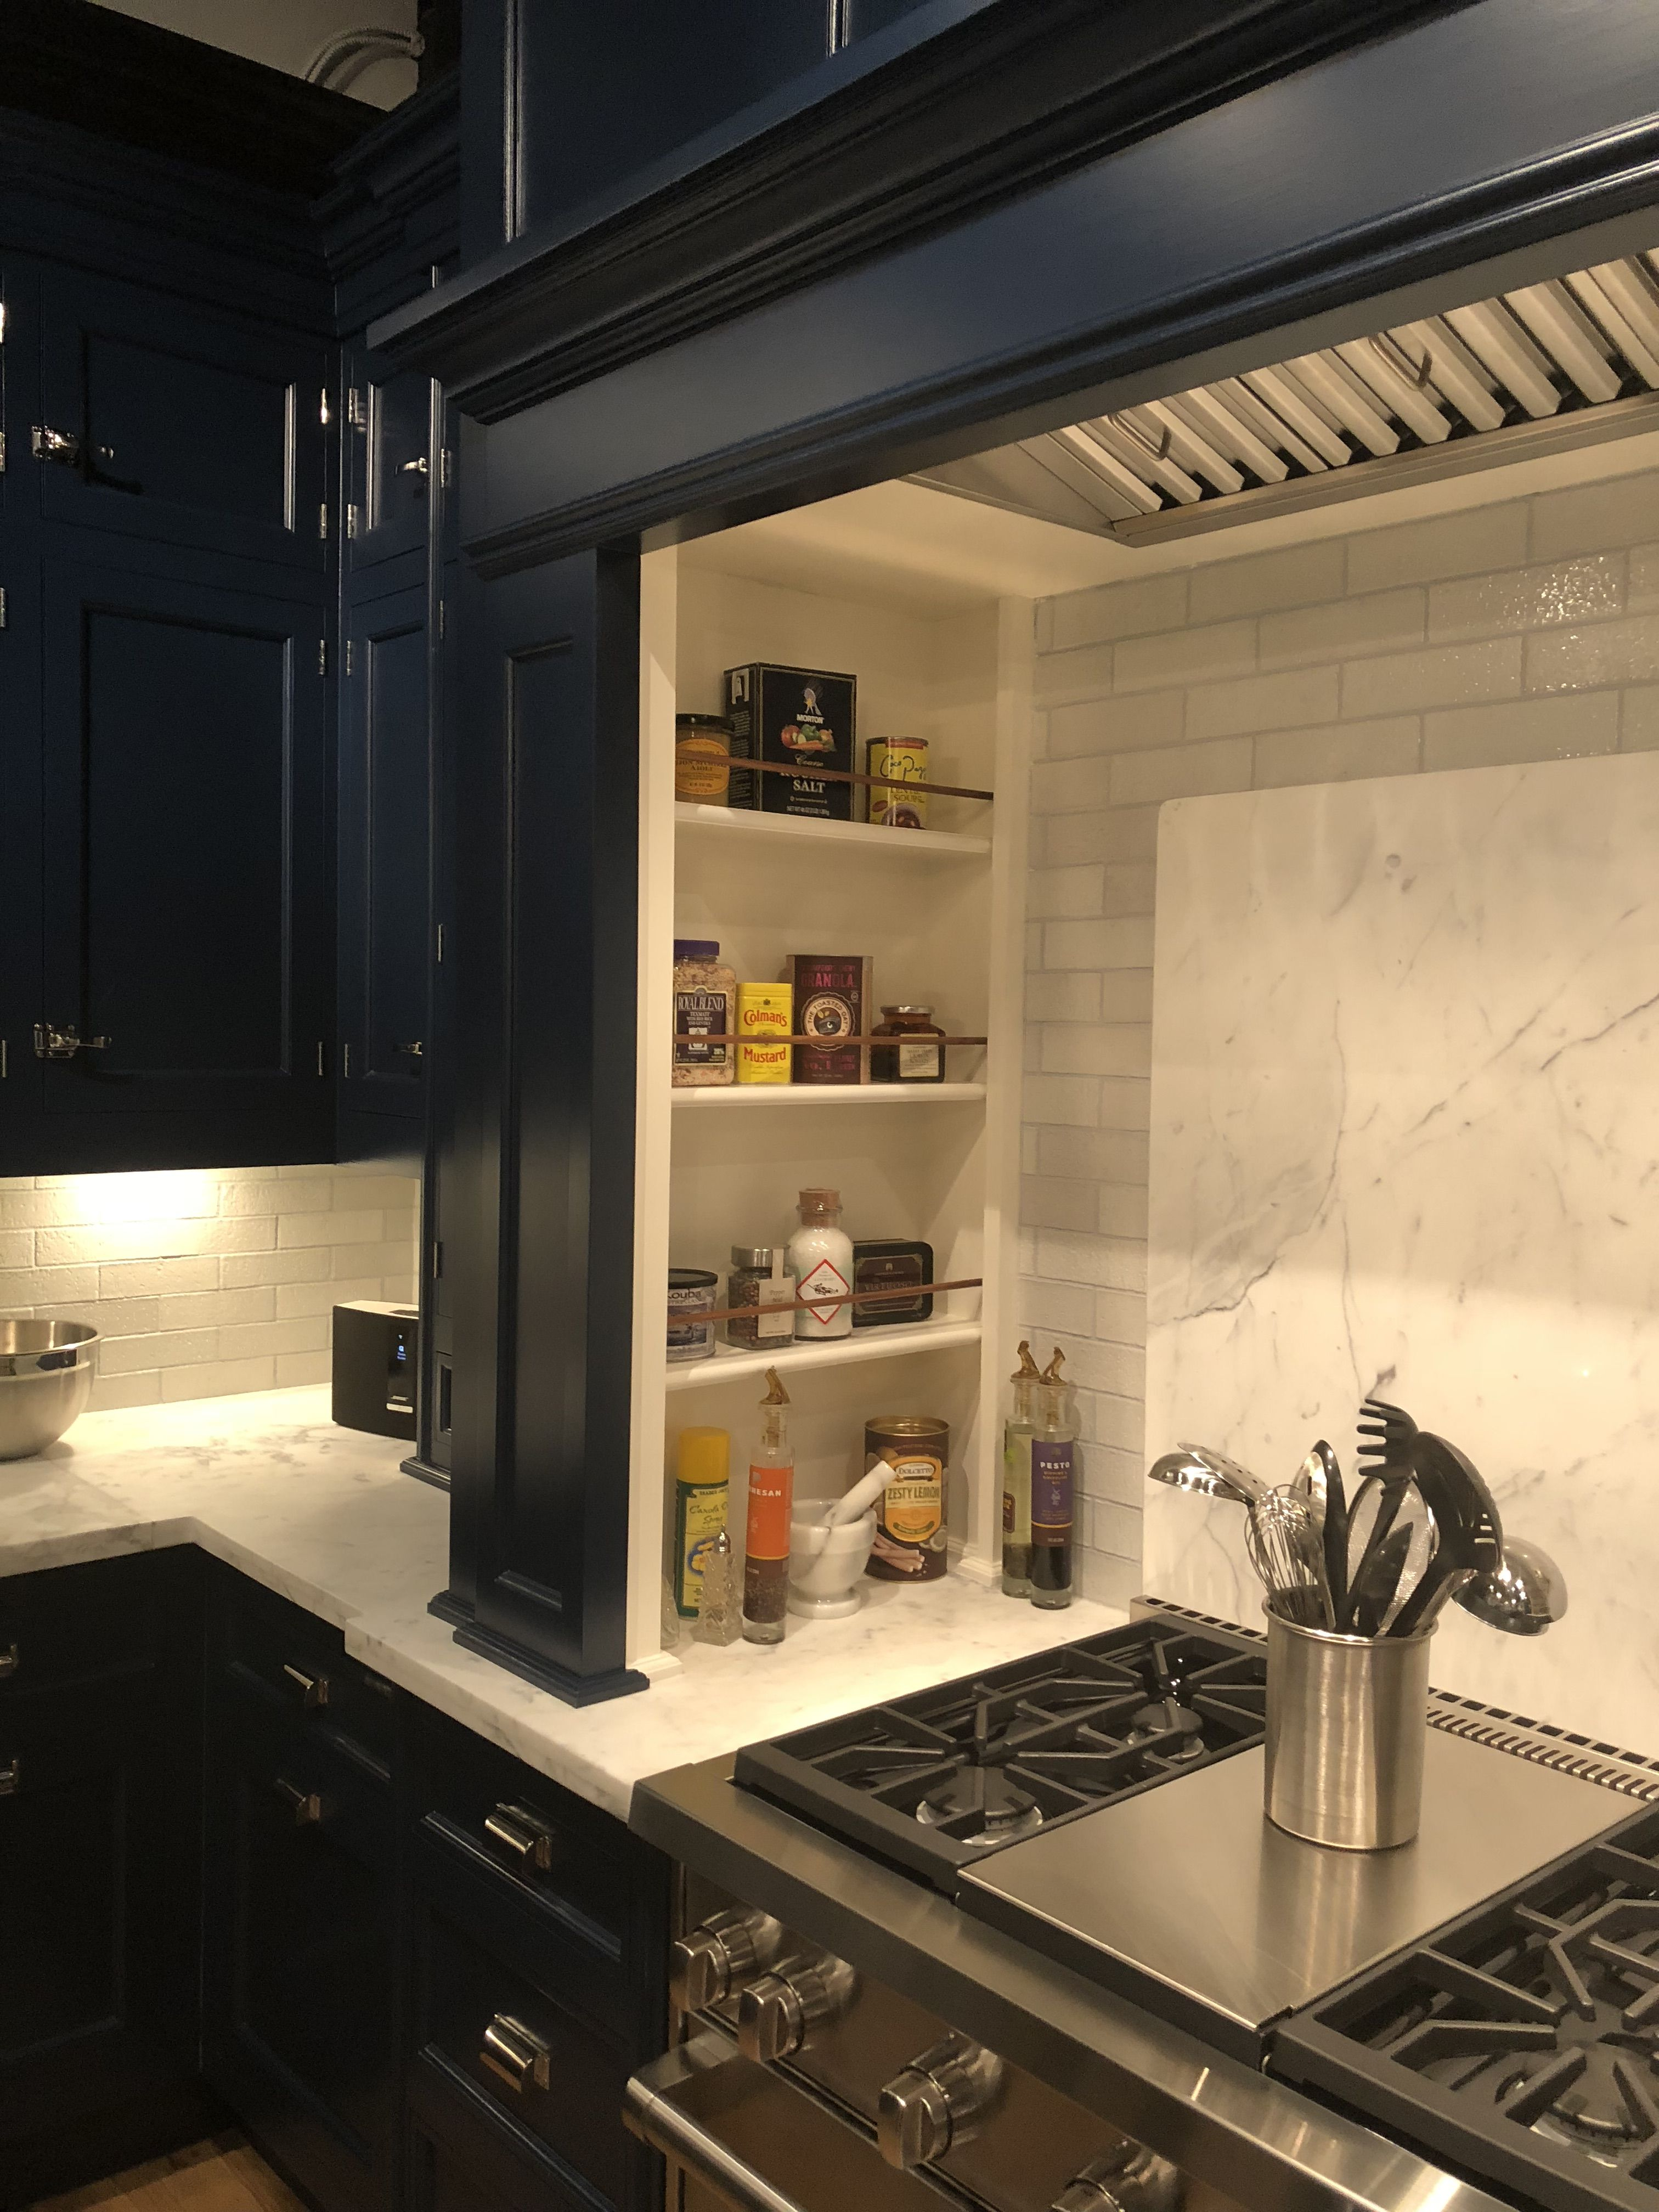 Custom Cabinetry With Spice Racks Custom Organize Luxury Kitchen And Bath Design Kitchen And Bath Bath Design